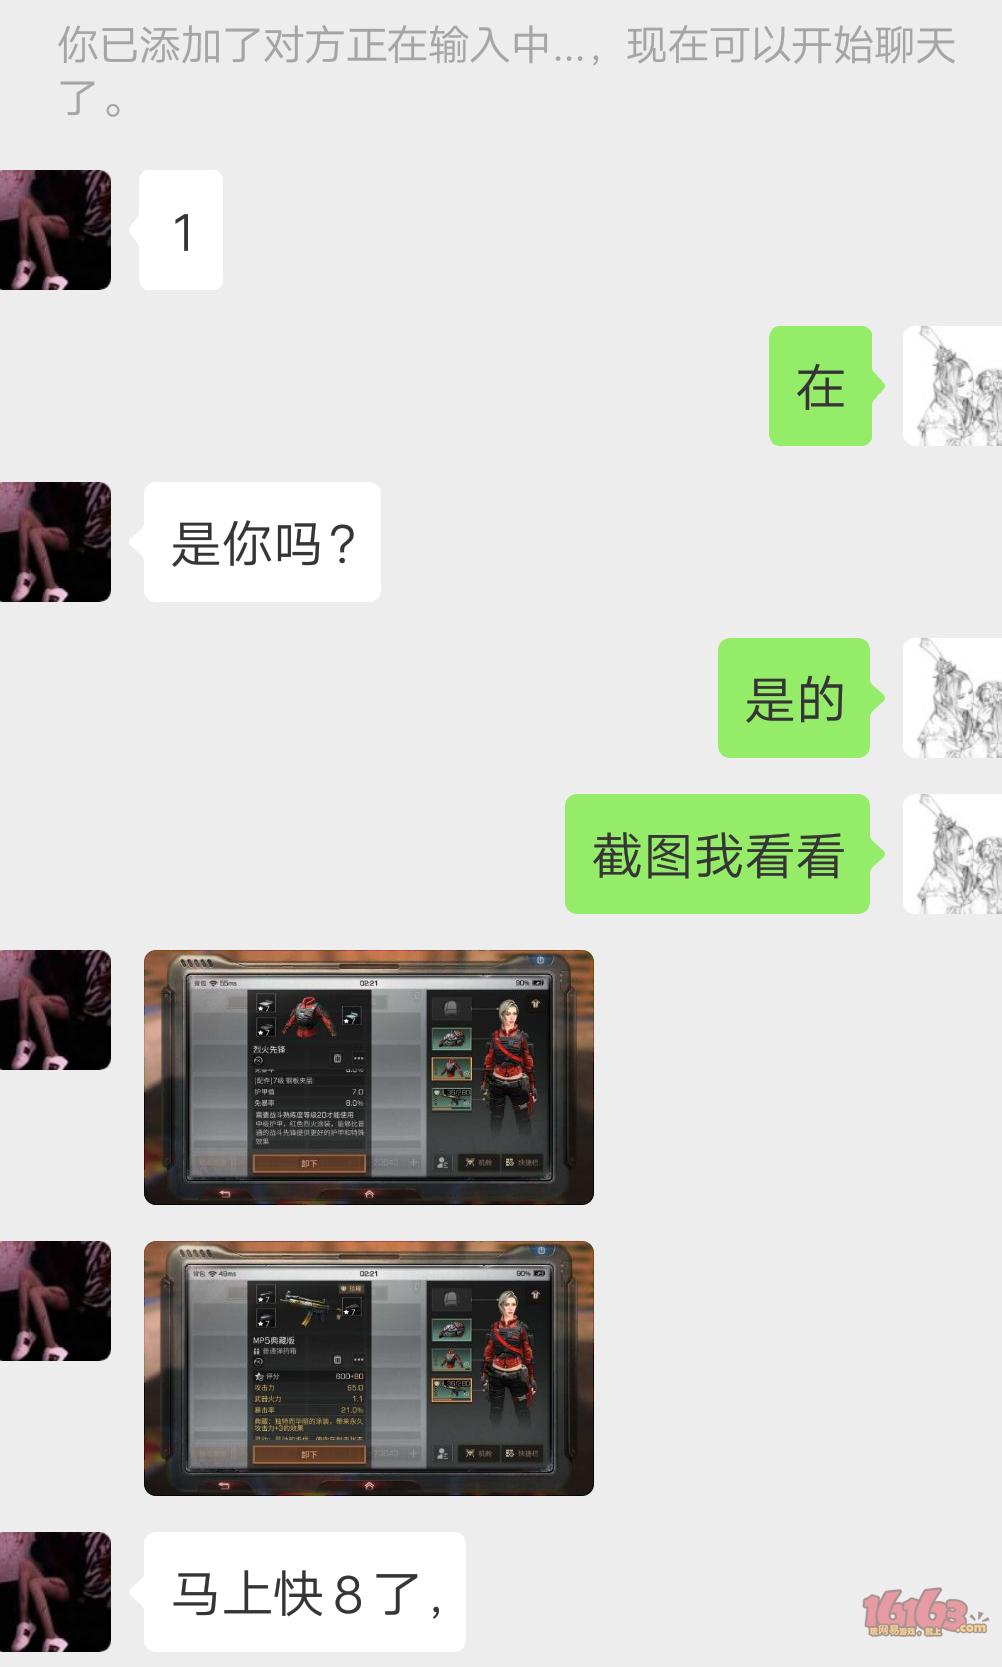 Screenshot_2019_0205_002105.png